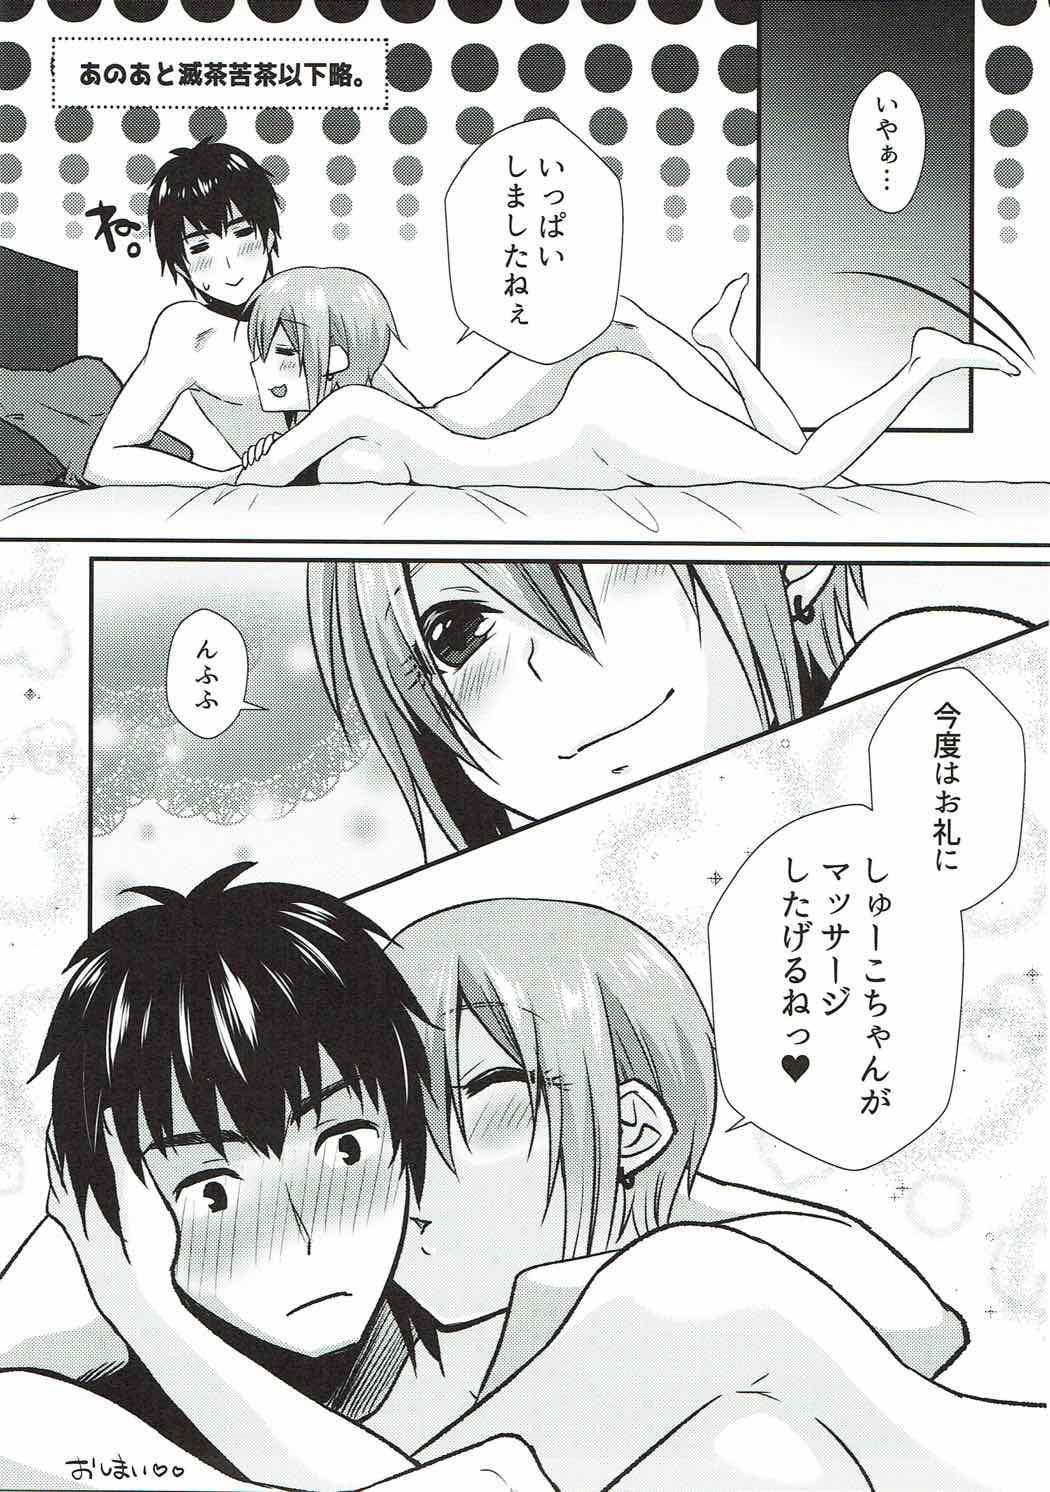 Syuko to Nurunuru Ichaicha Massage 25